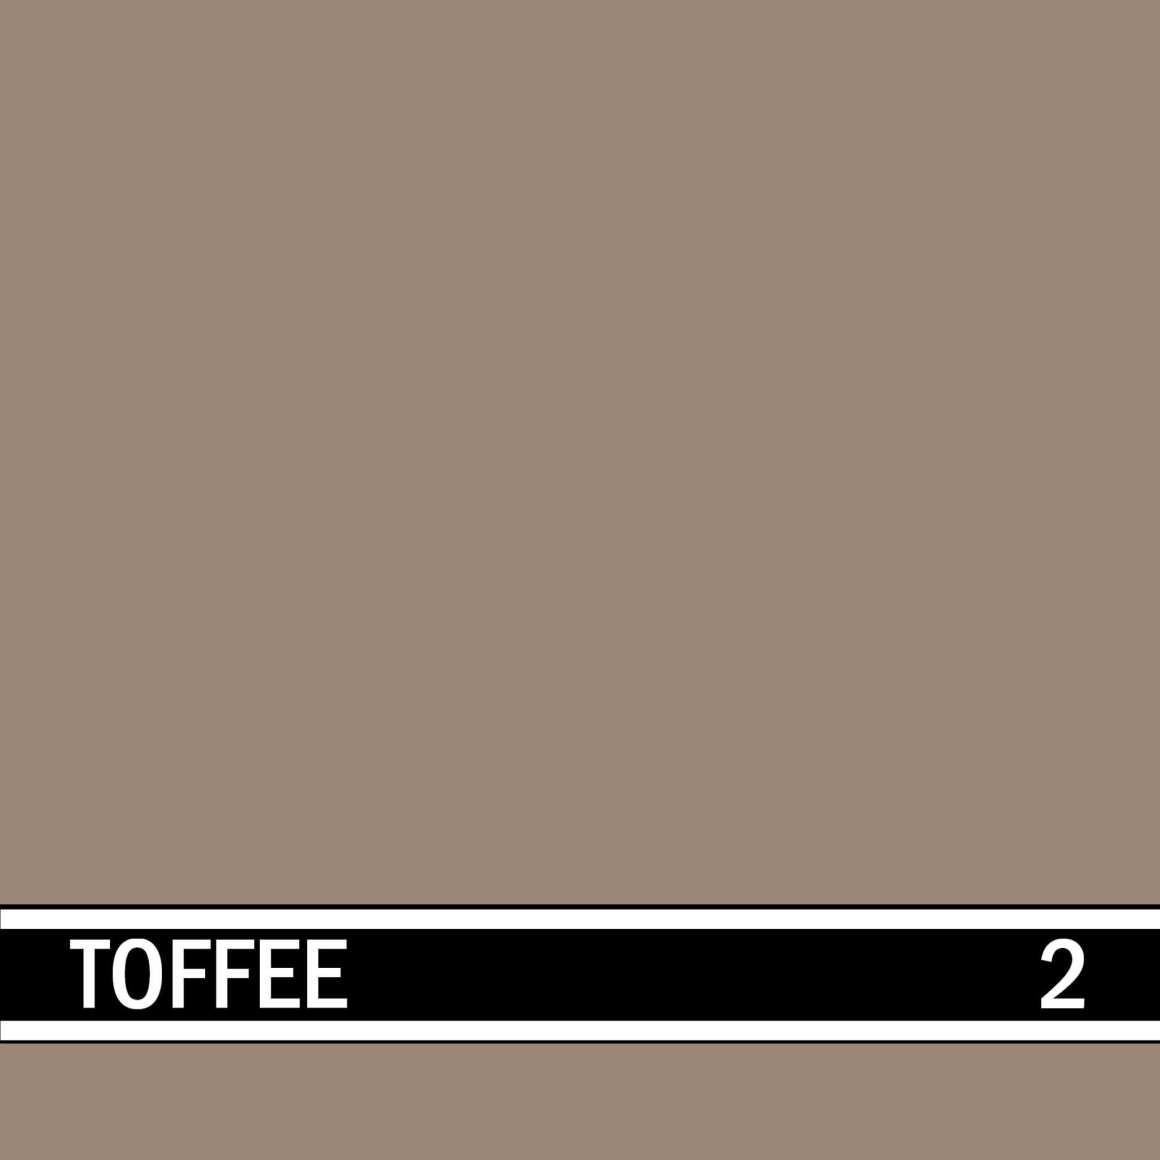 Toffee integral concrete color for stamped concrete and decorative colored concrete